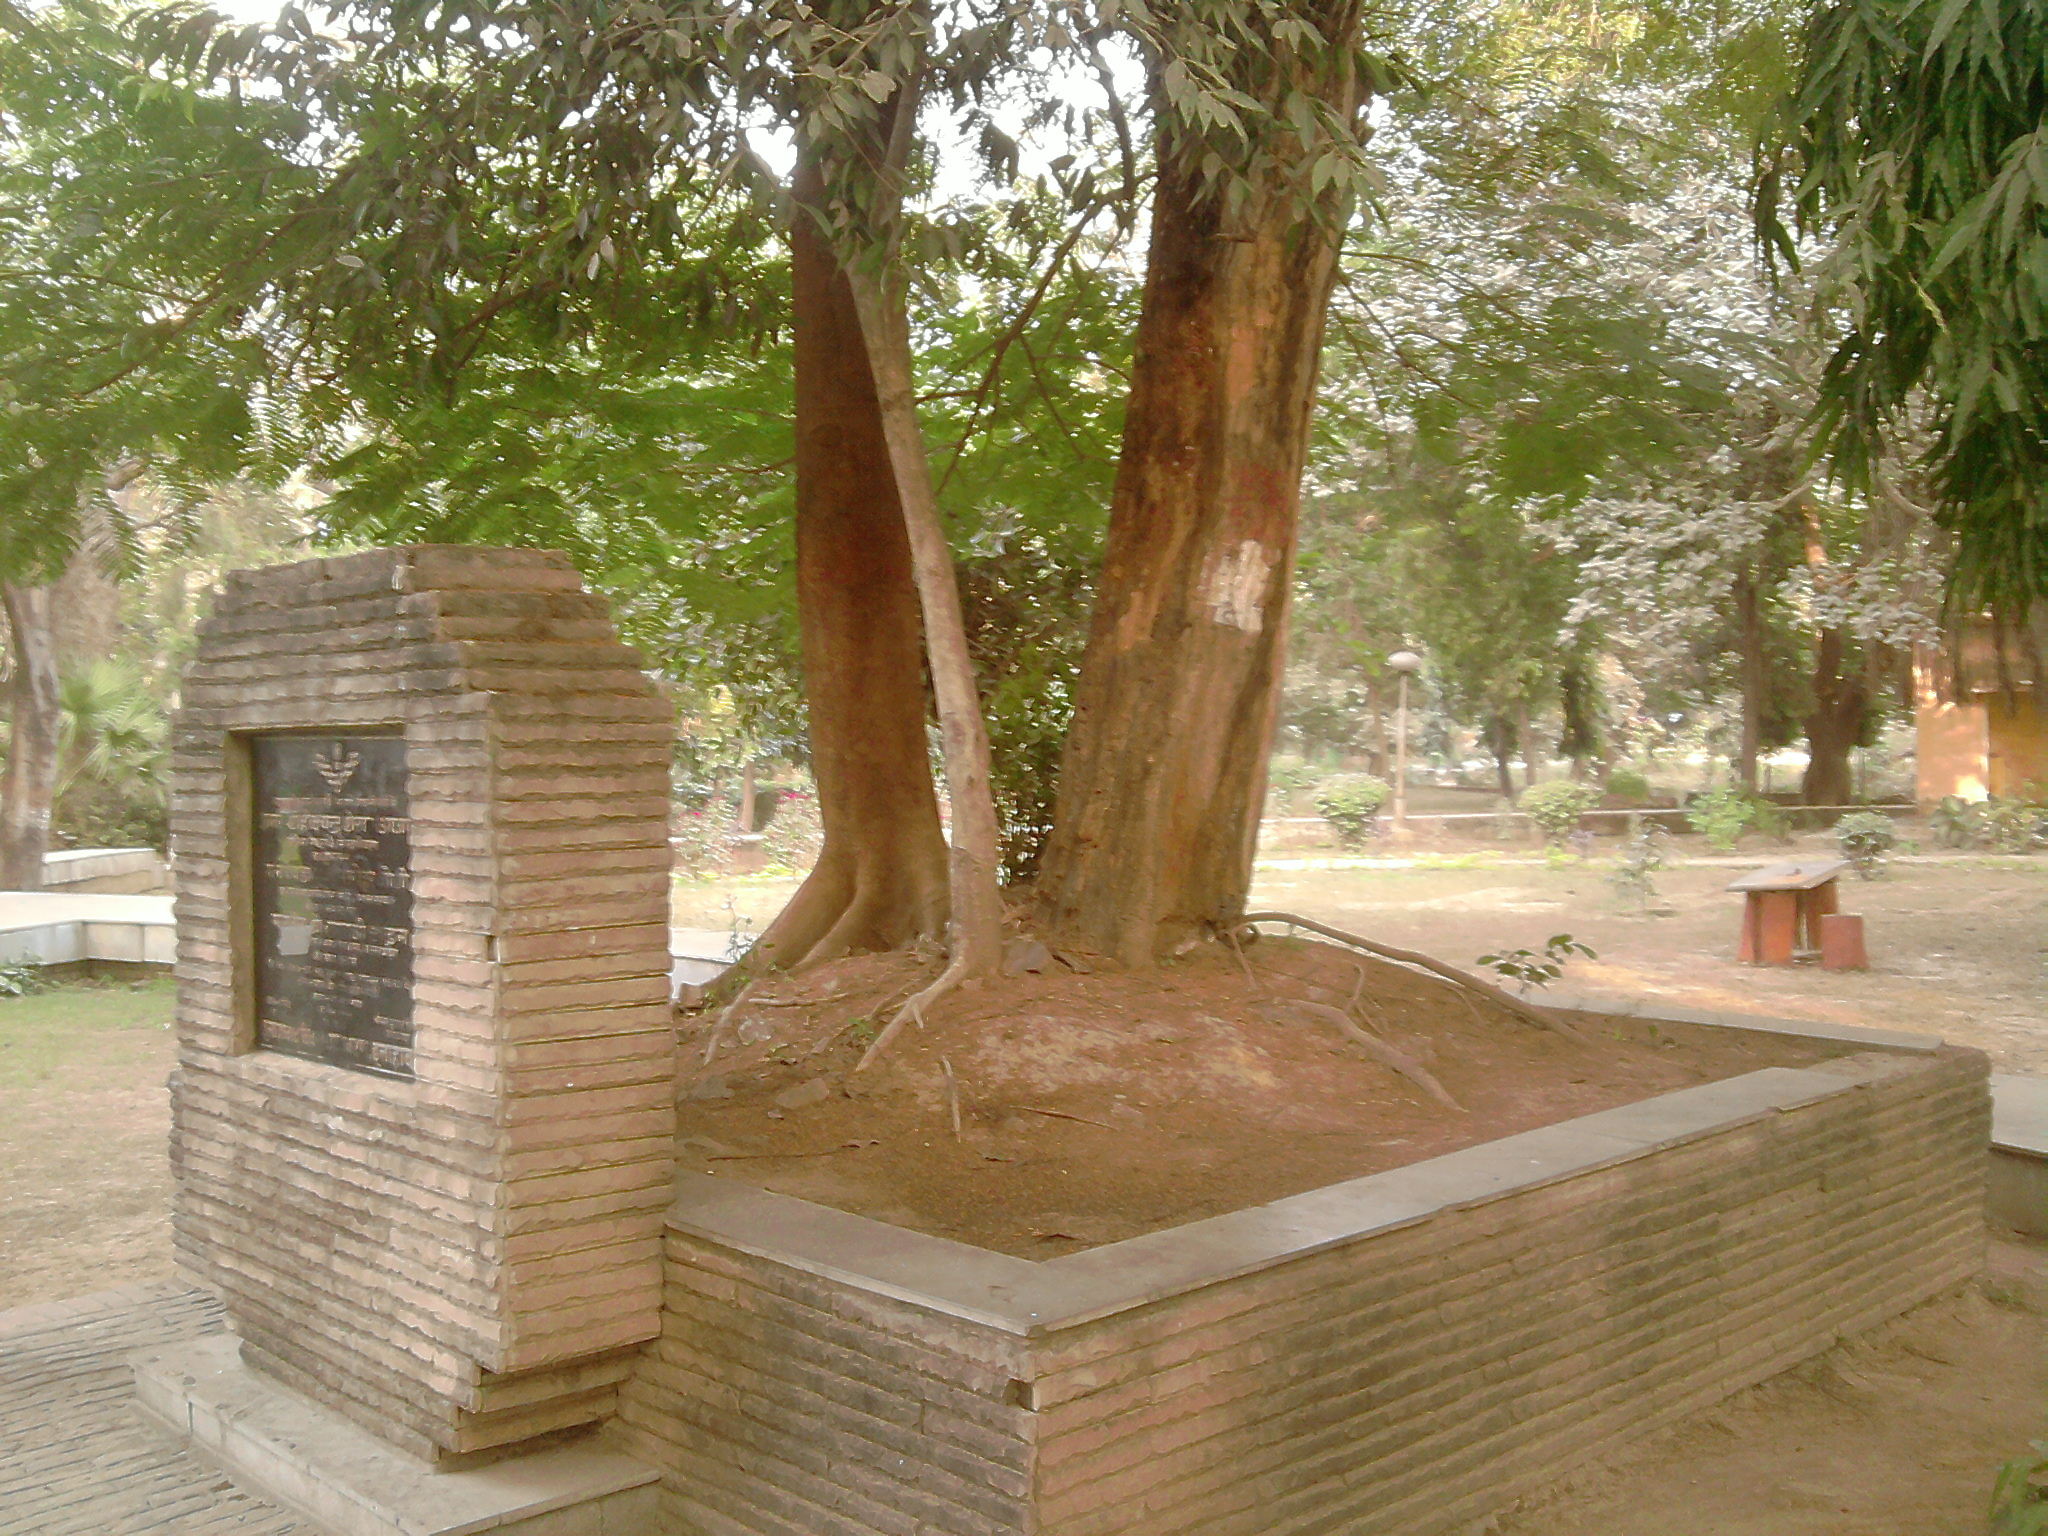 Best Place in Prayagraj-Chandrasekhar Azad Park